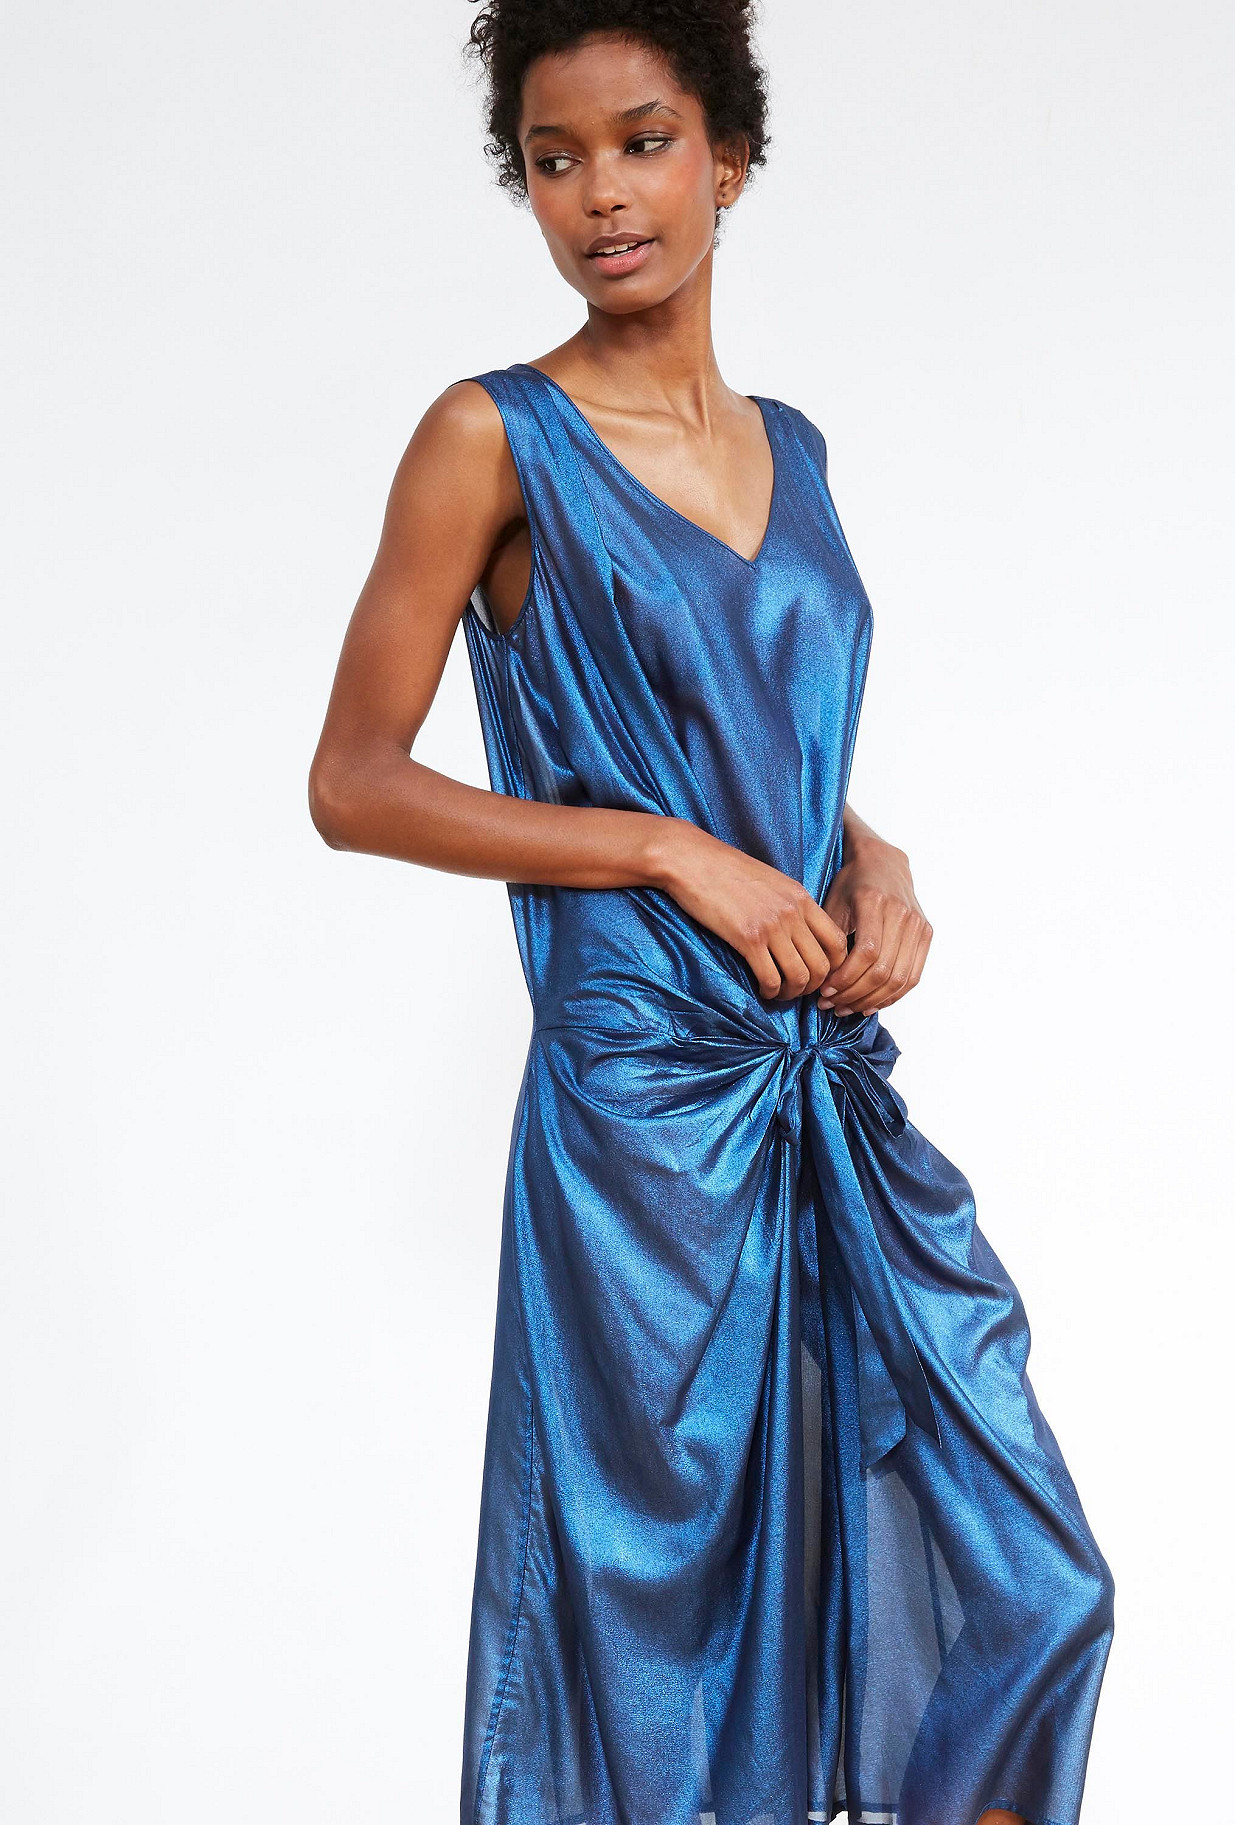 clothes store DRESS  Synergy french designer fashion Paris